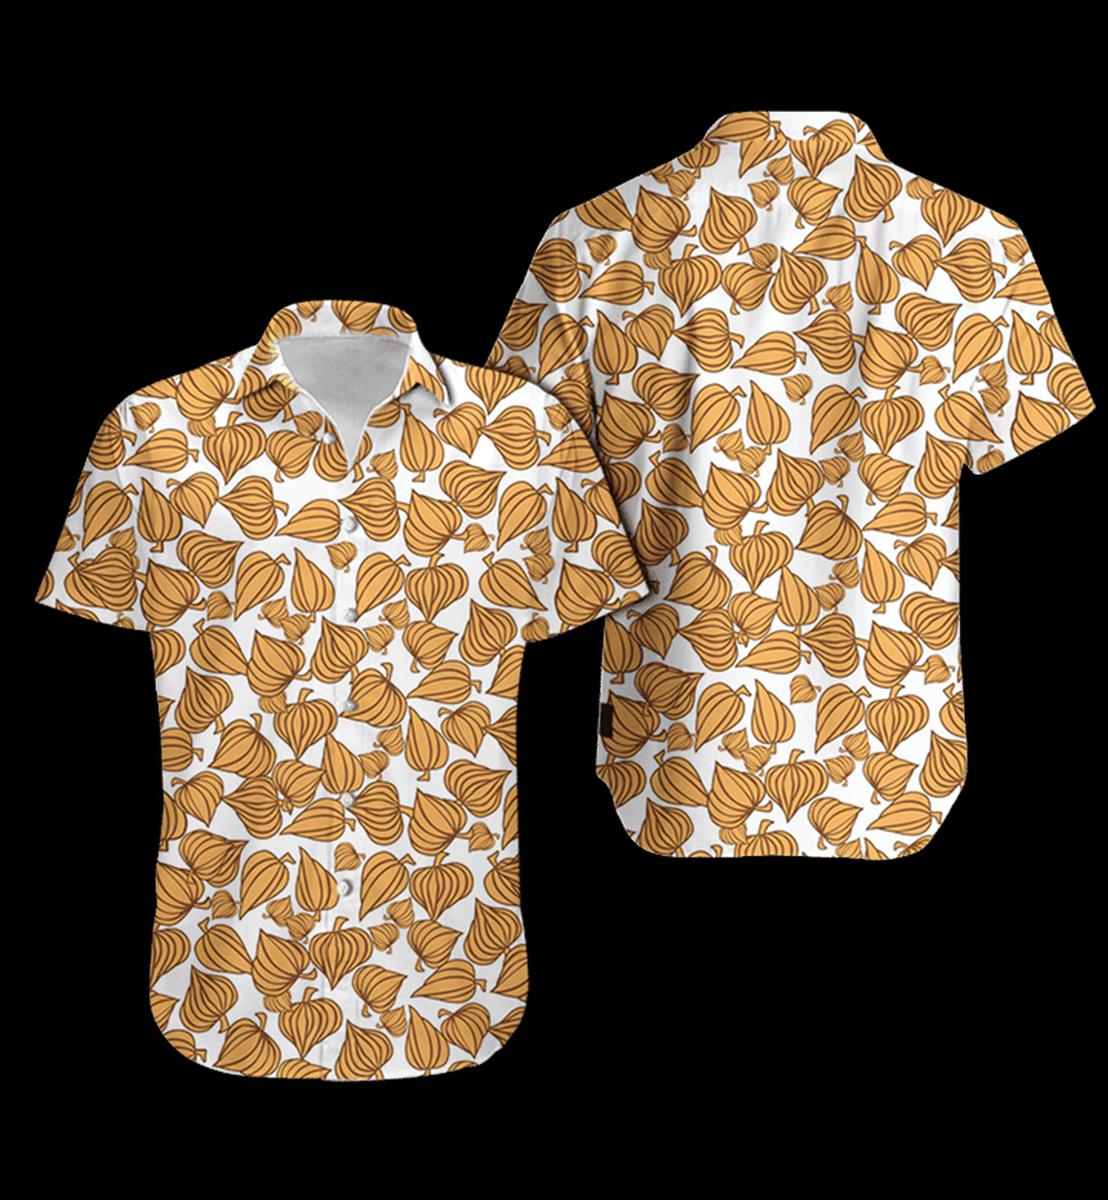 7 Seinfeld Hawaiian Shirt and Short 1 1